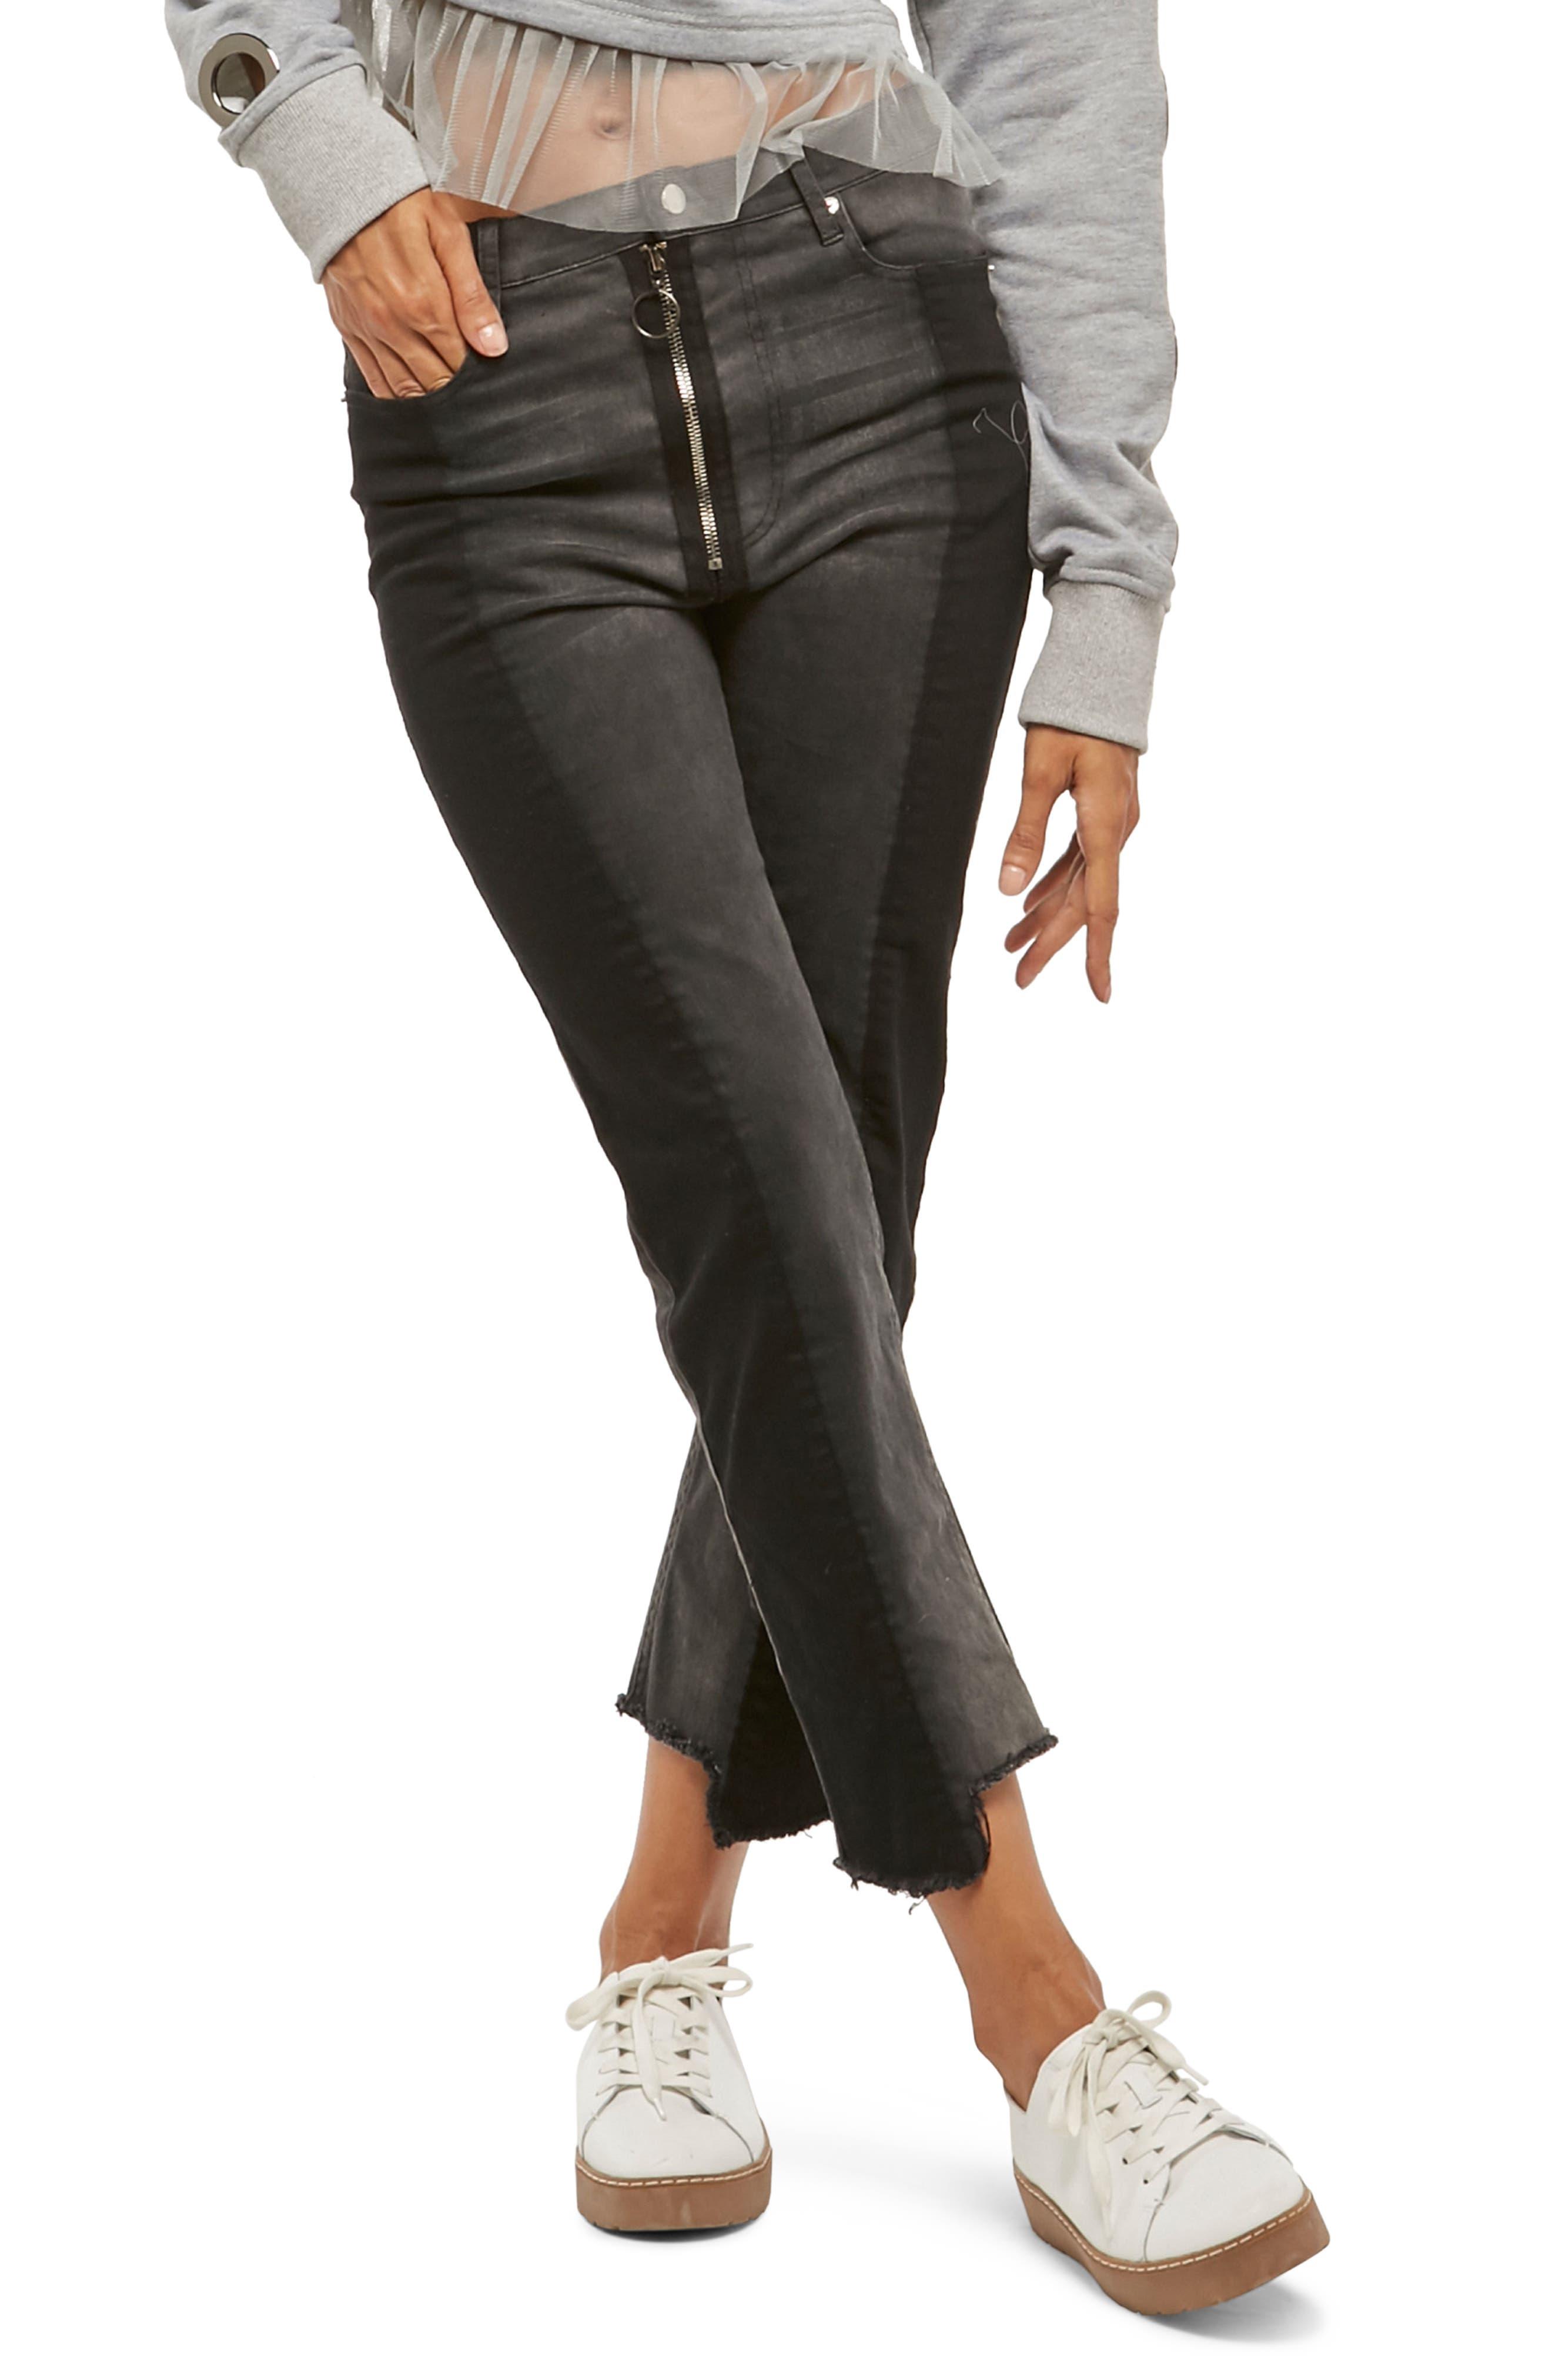 Alpha & Omega Two-Tone Crop Jeans,                         Main,                         color, Black